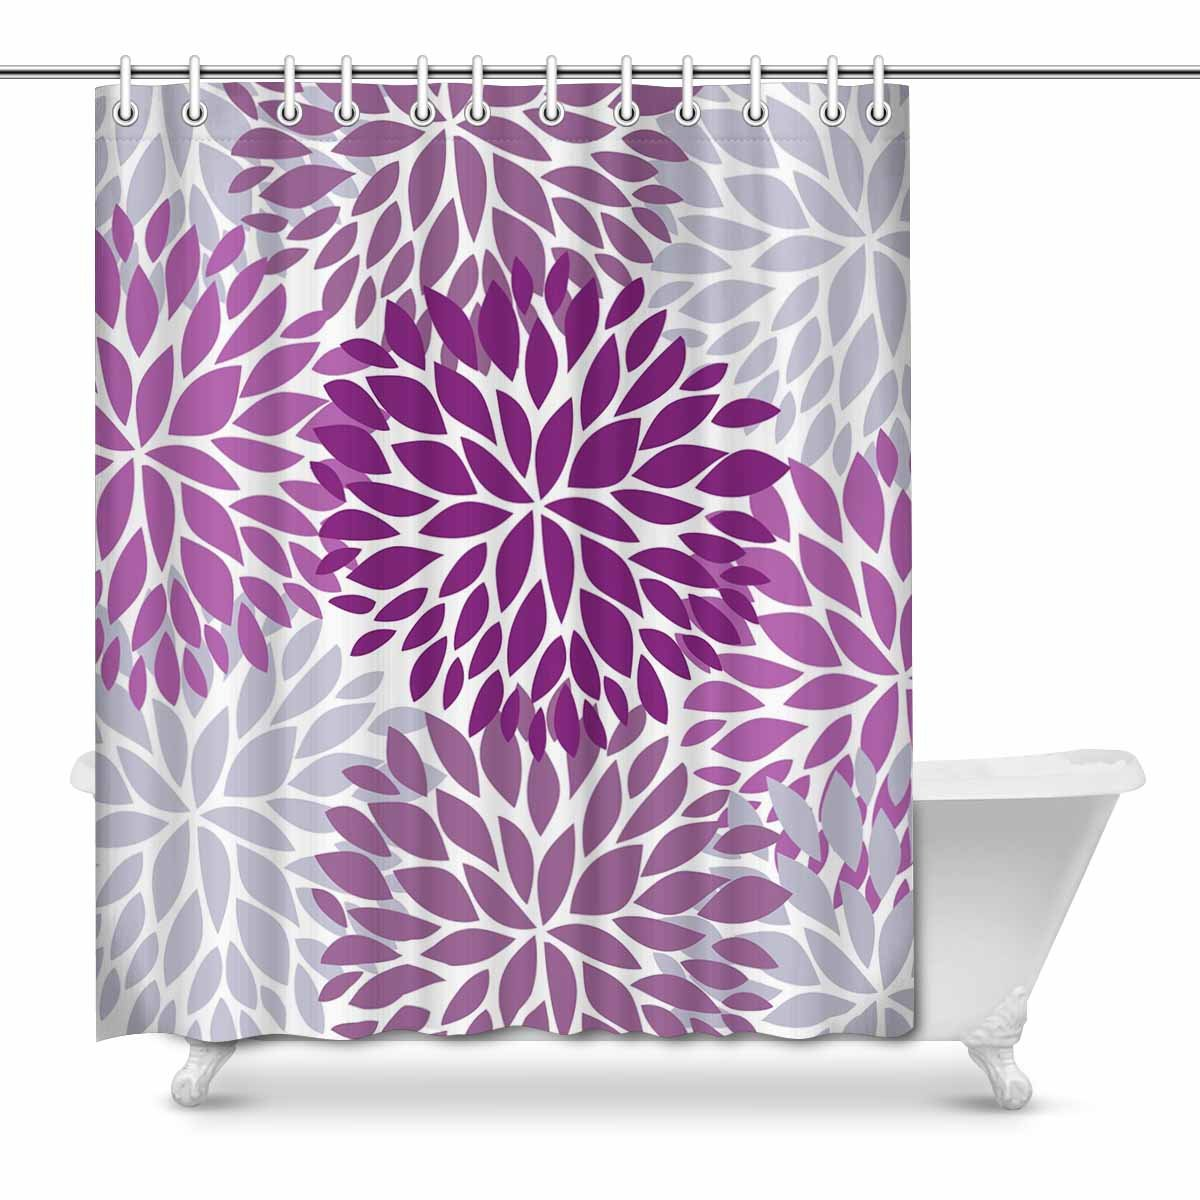 mkhert dahlia pinnata flower purple and gray waterproof shower curtain decor floral fabric. Black Bedroom Furniture Sets. Home Design Ideas